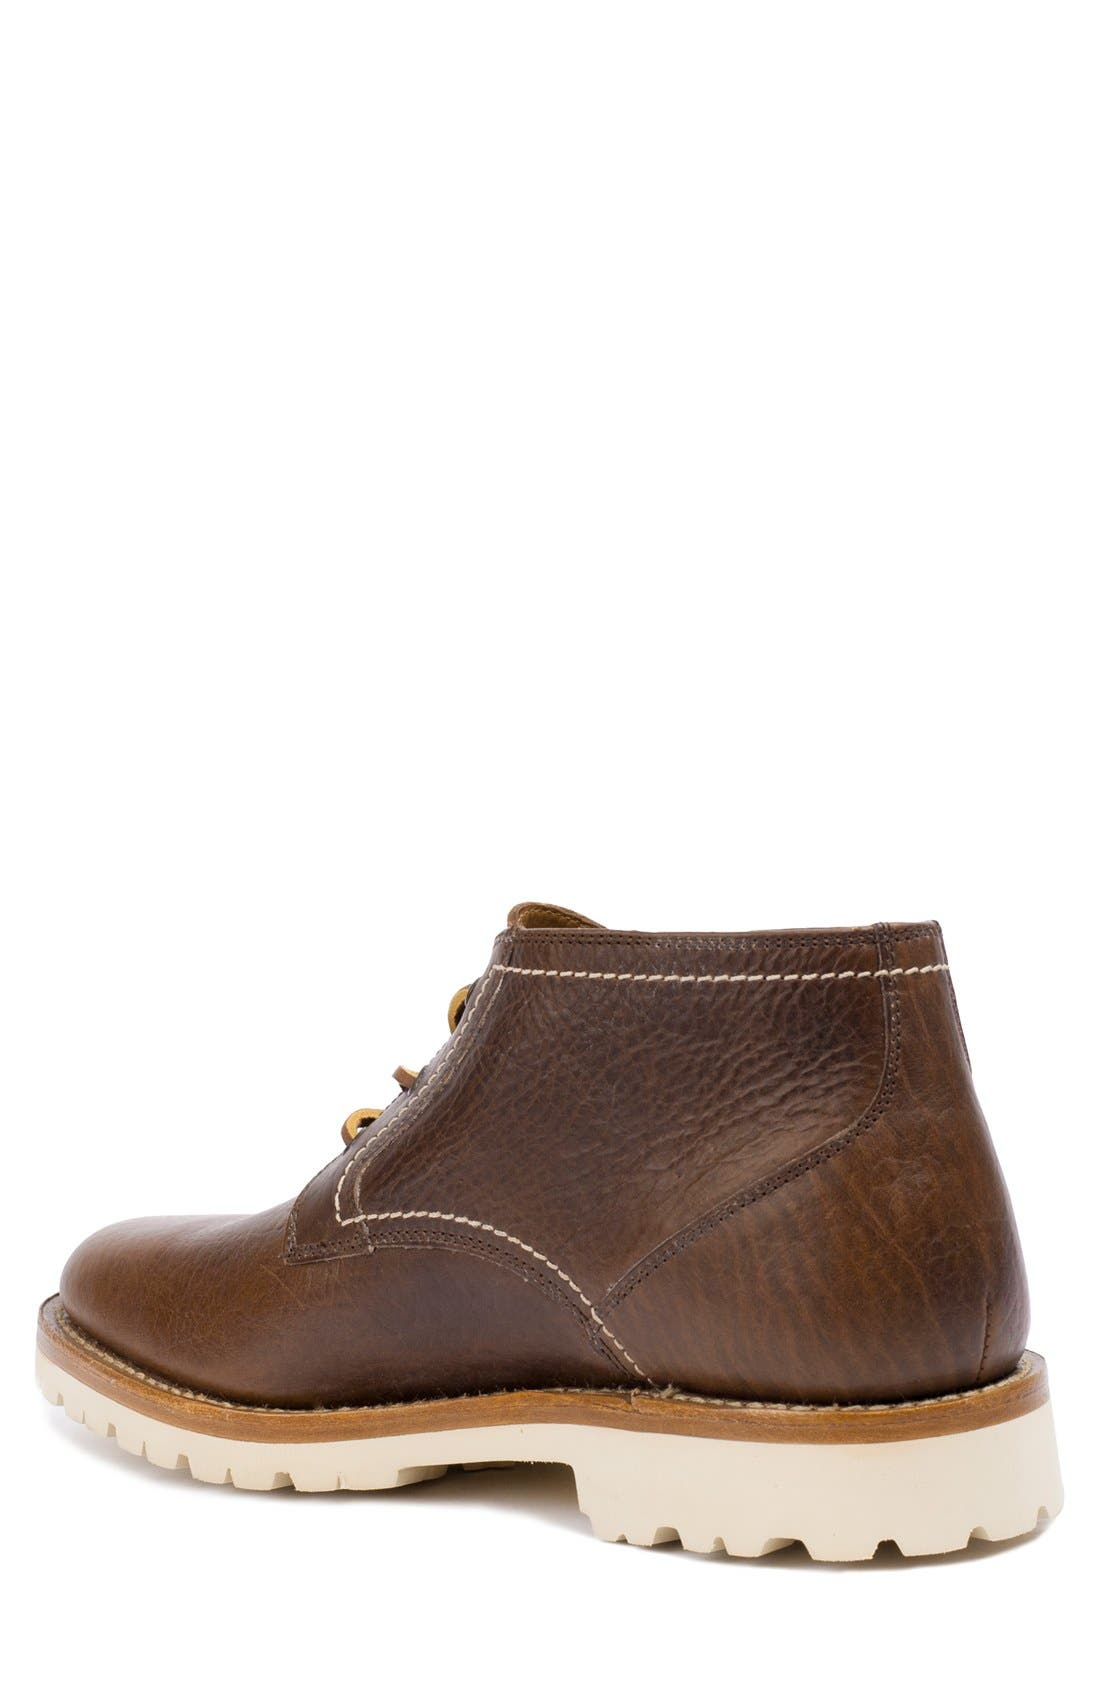 'Bighorn' Plain Toe Boot,                             Alternate thumbnail 4, color,